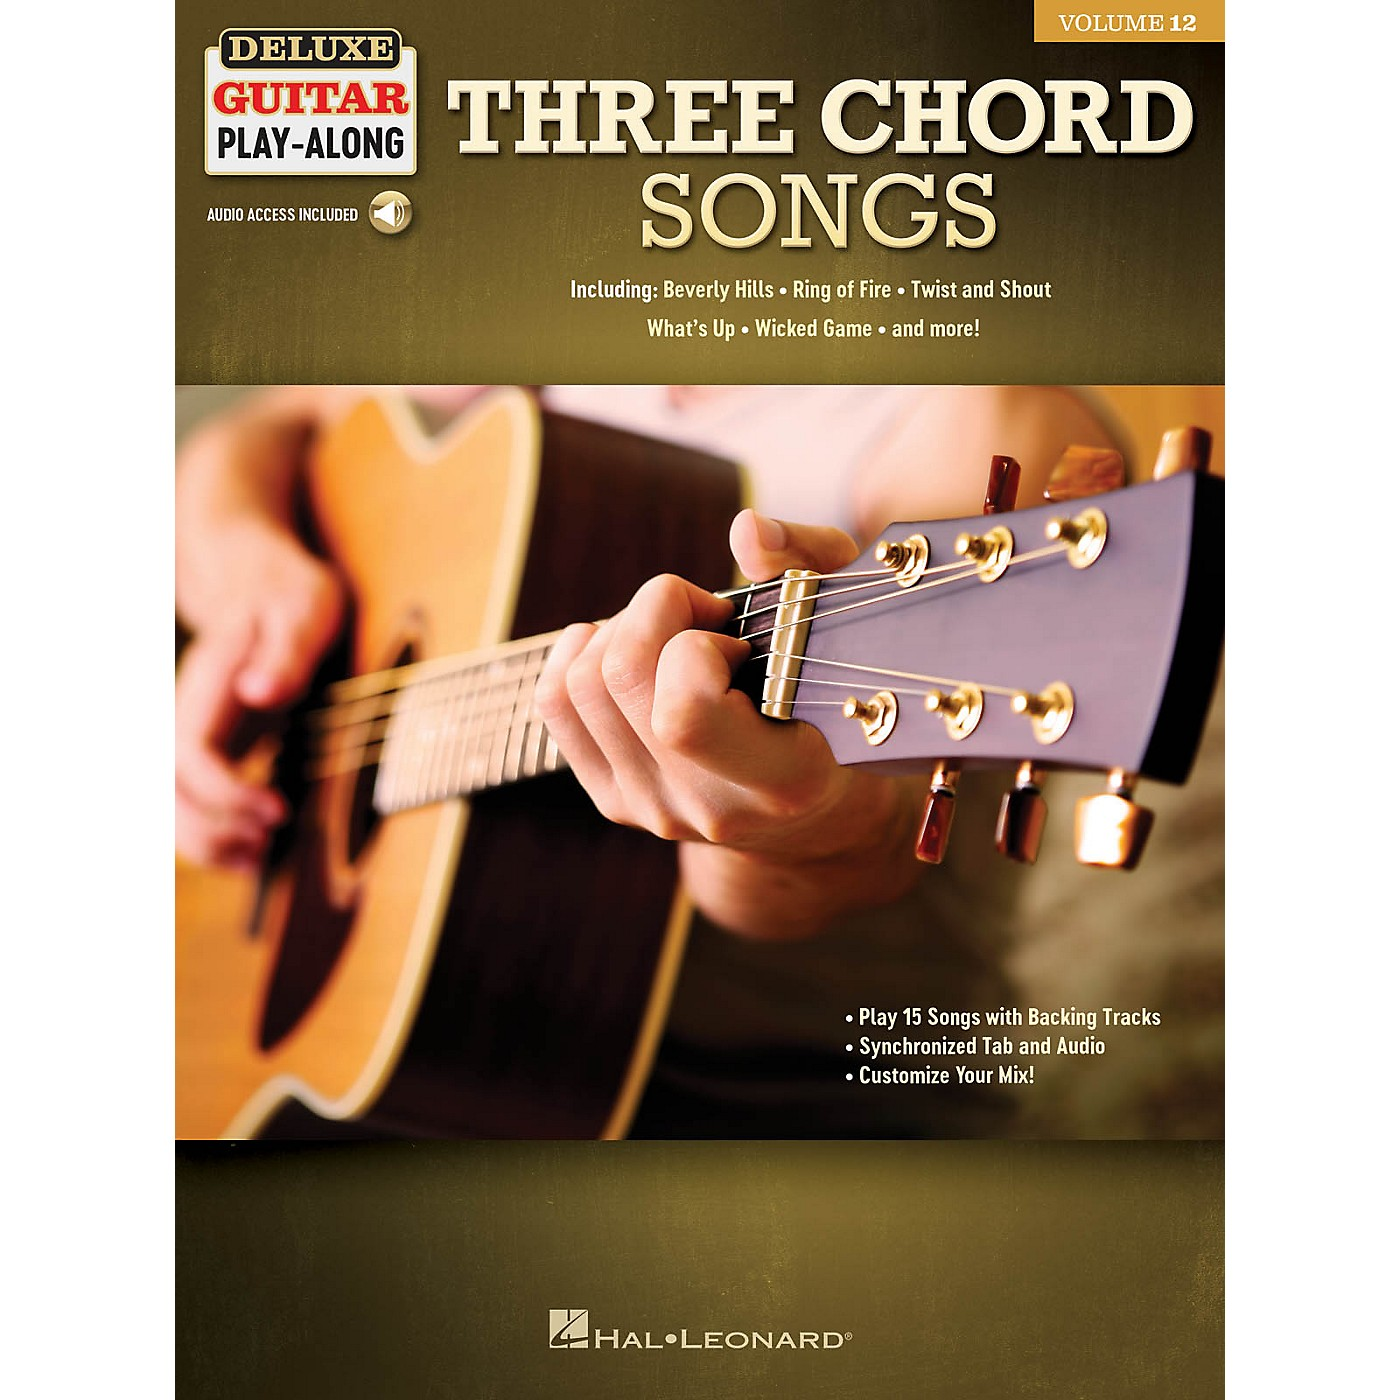 Hal Leonard Three Chord Songs Deluxe Guitar Play-Along Volume 12 Book/Audio Online thumbnail